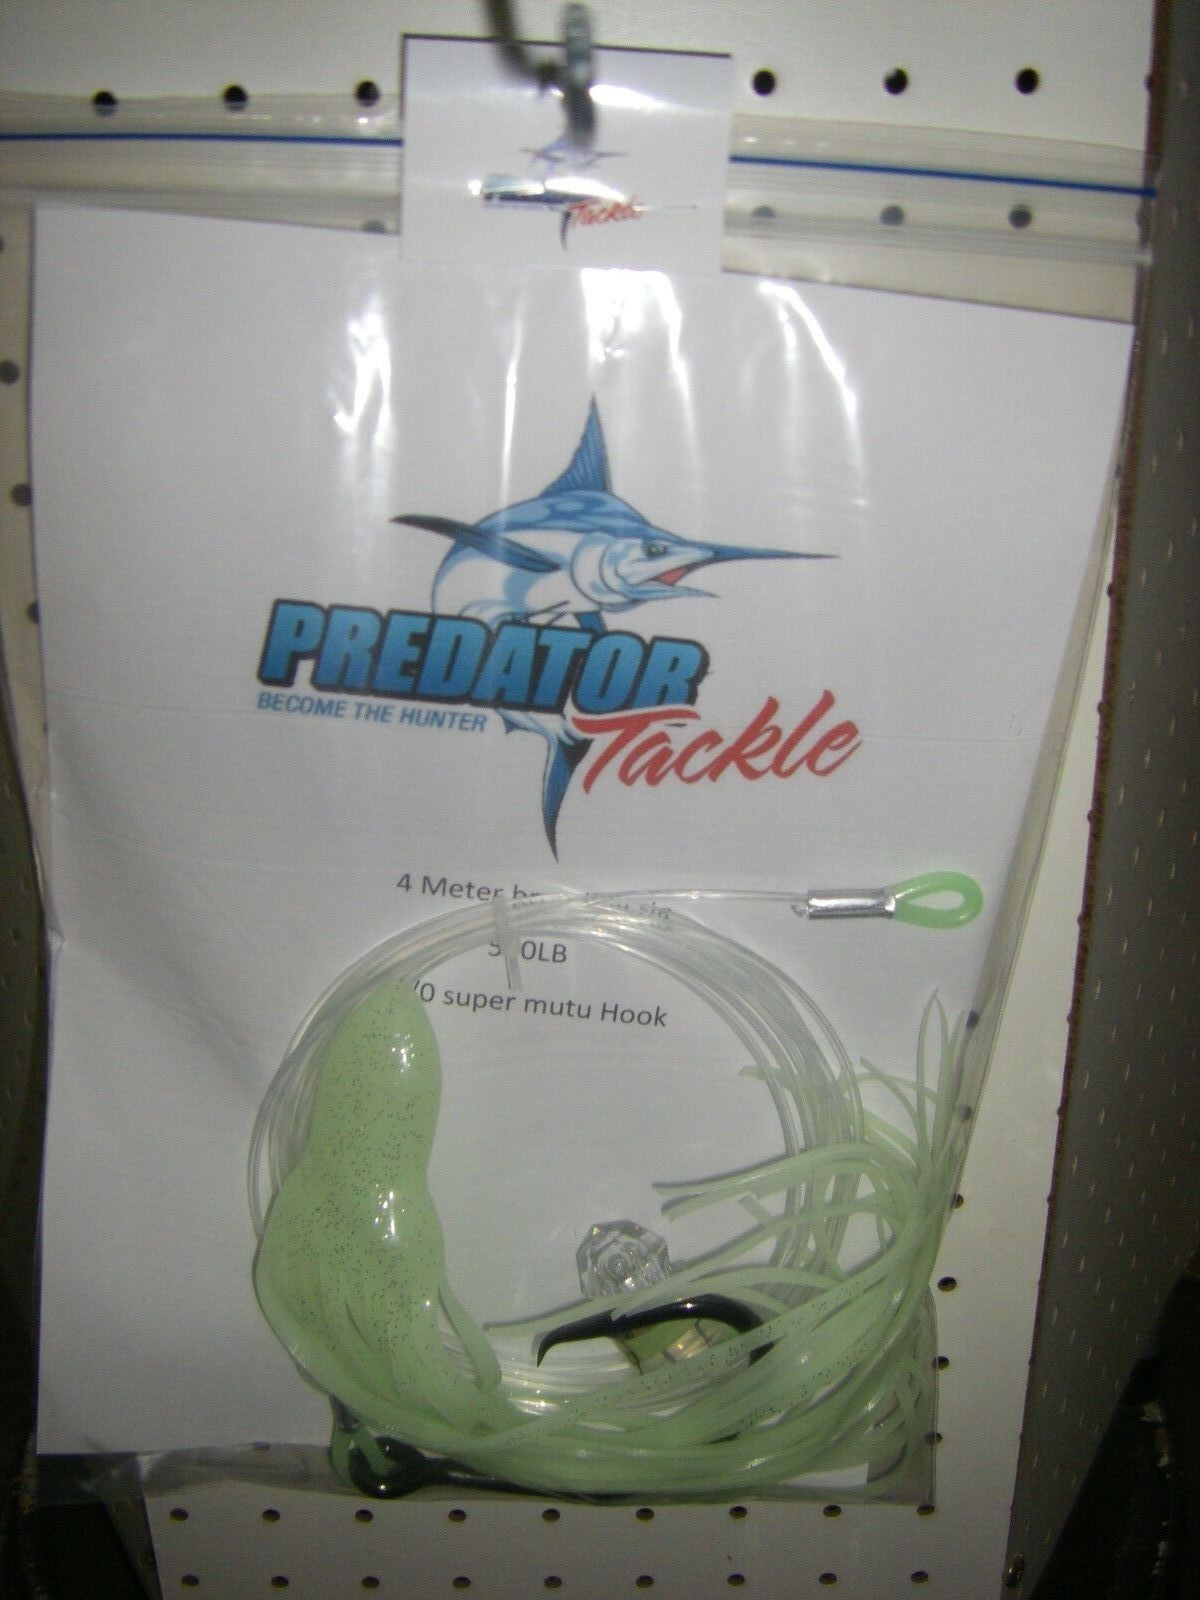 Broadbill swordfish rig 4 mtr 500lb flurocarbon with 16 0 grander circle  hook